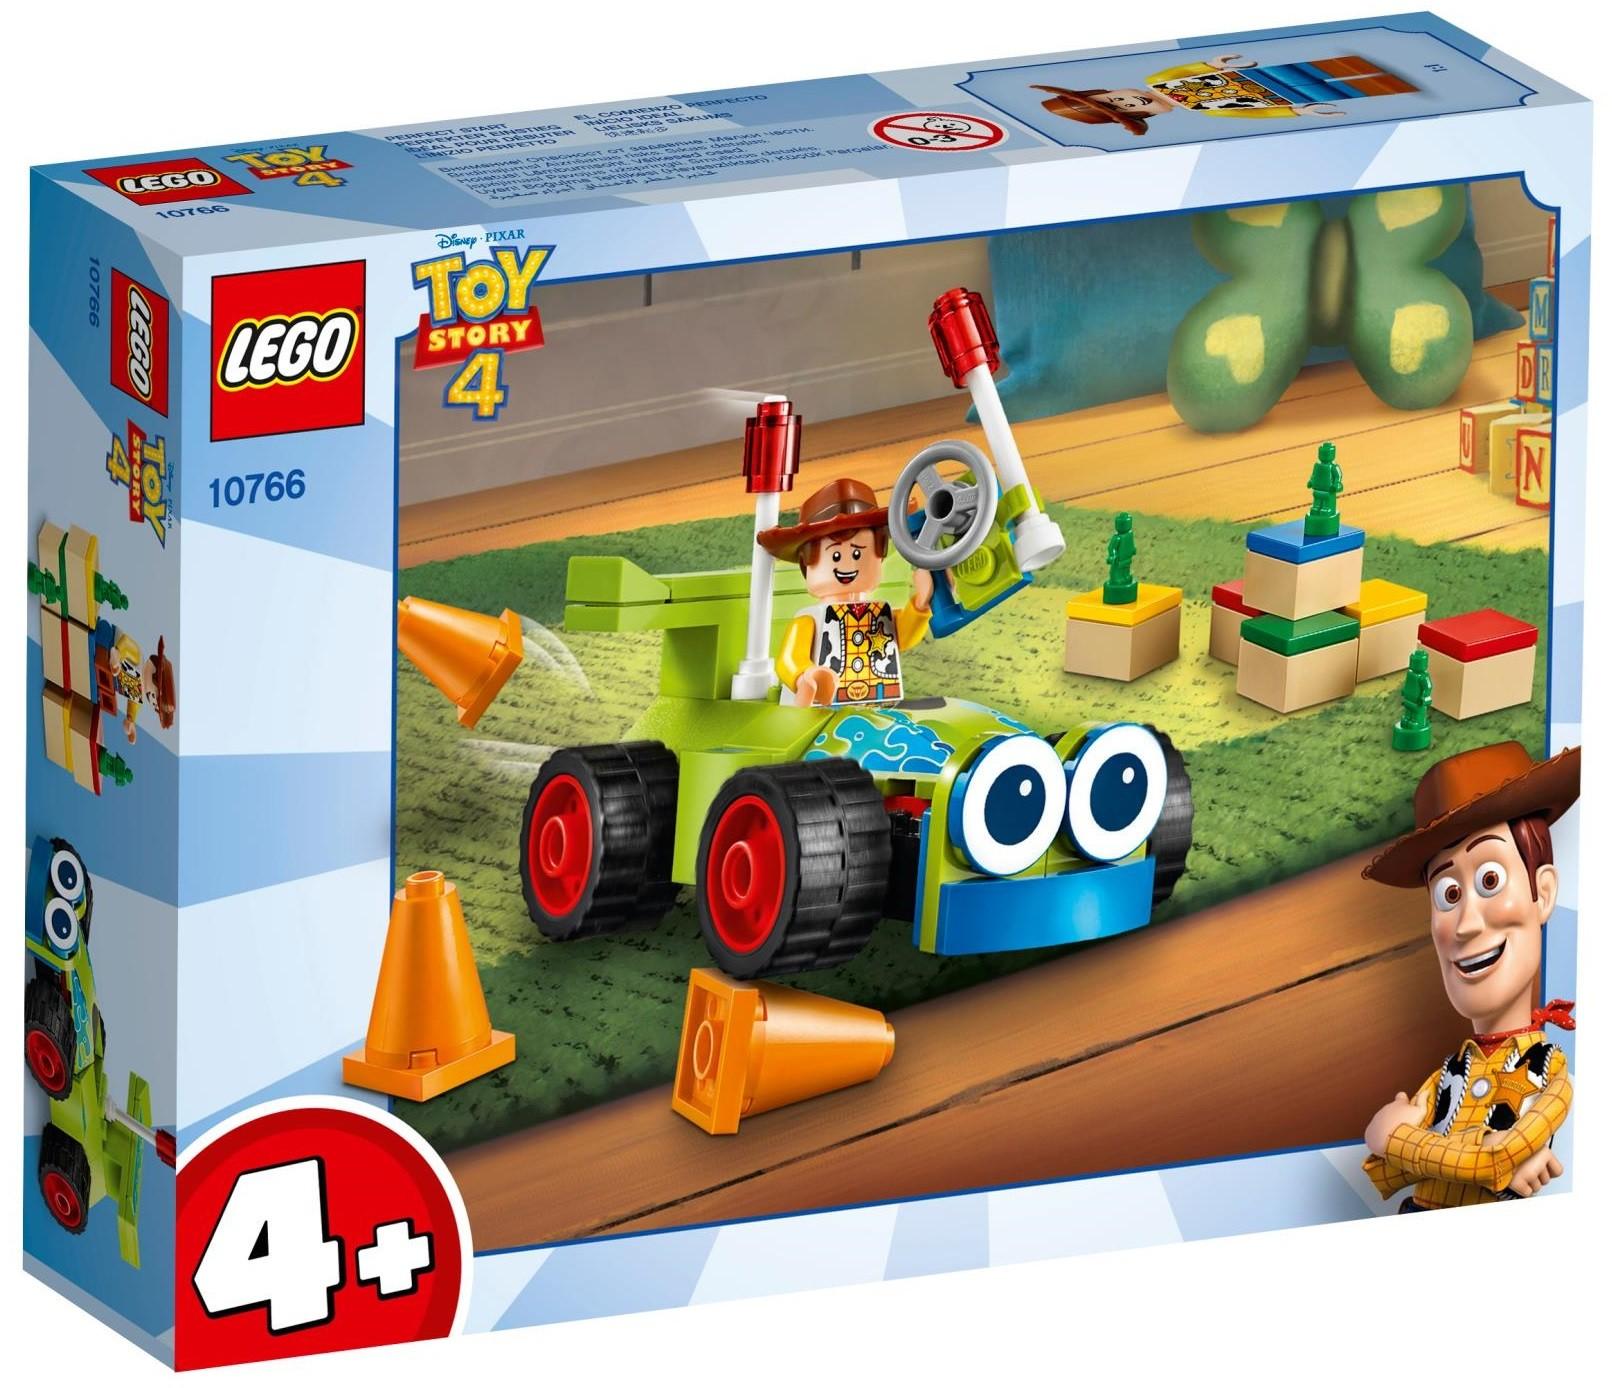 Lego Toy Story 4 10766 Chudy I Pan Sterowany Super Oferty Na Klocki